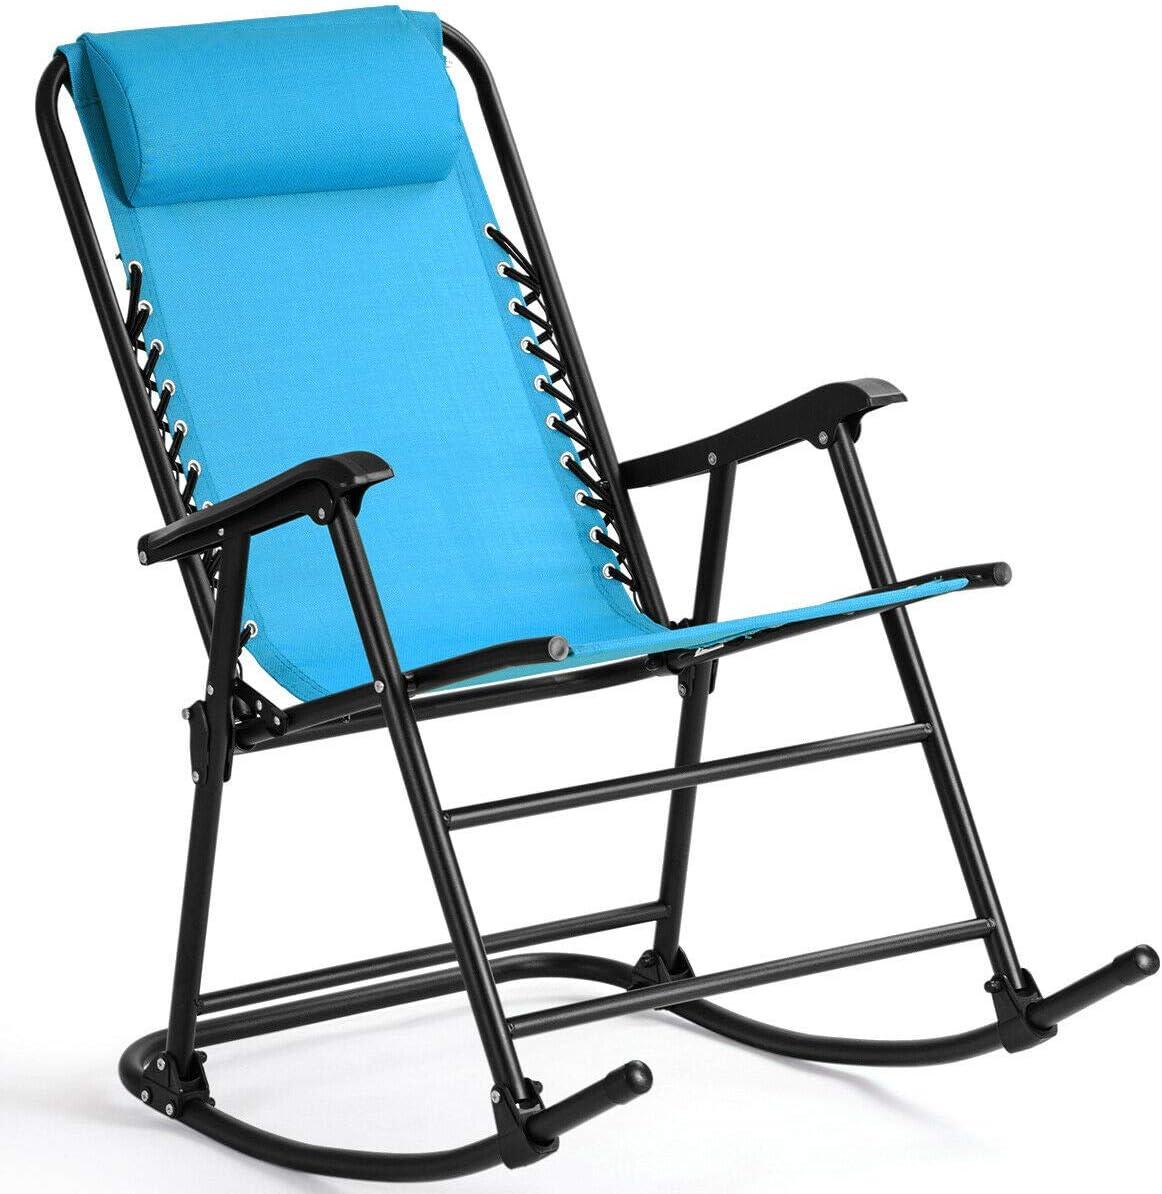 Folding Zero Gravity Rocking Chair Rocker Armrest Comfortable Headrest Glider Porch Seat Backyard Patio Lawn Deck Outdoor Garden Pool Side Furniture Solid Steel Construction Ergonomic Design